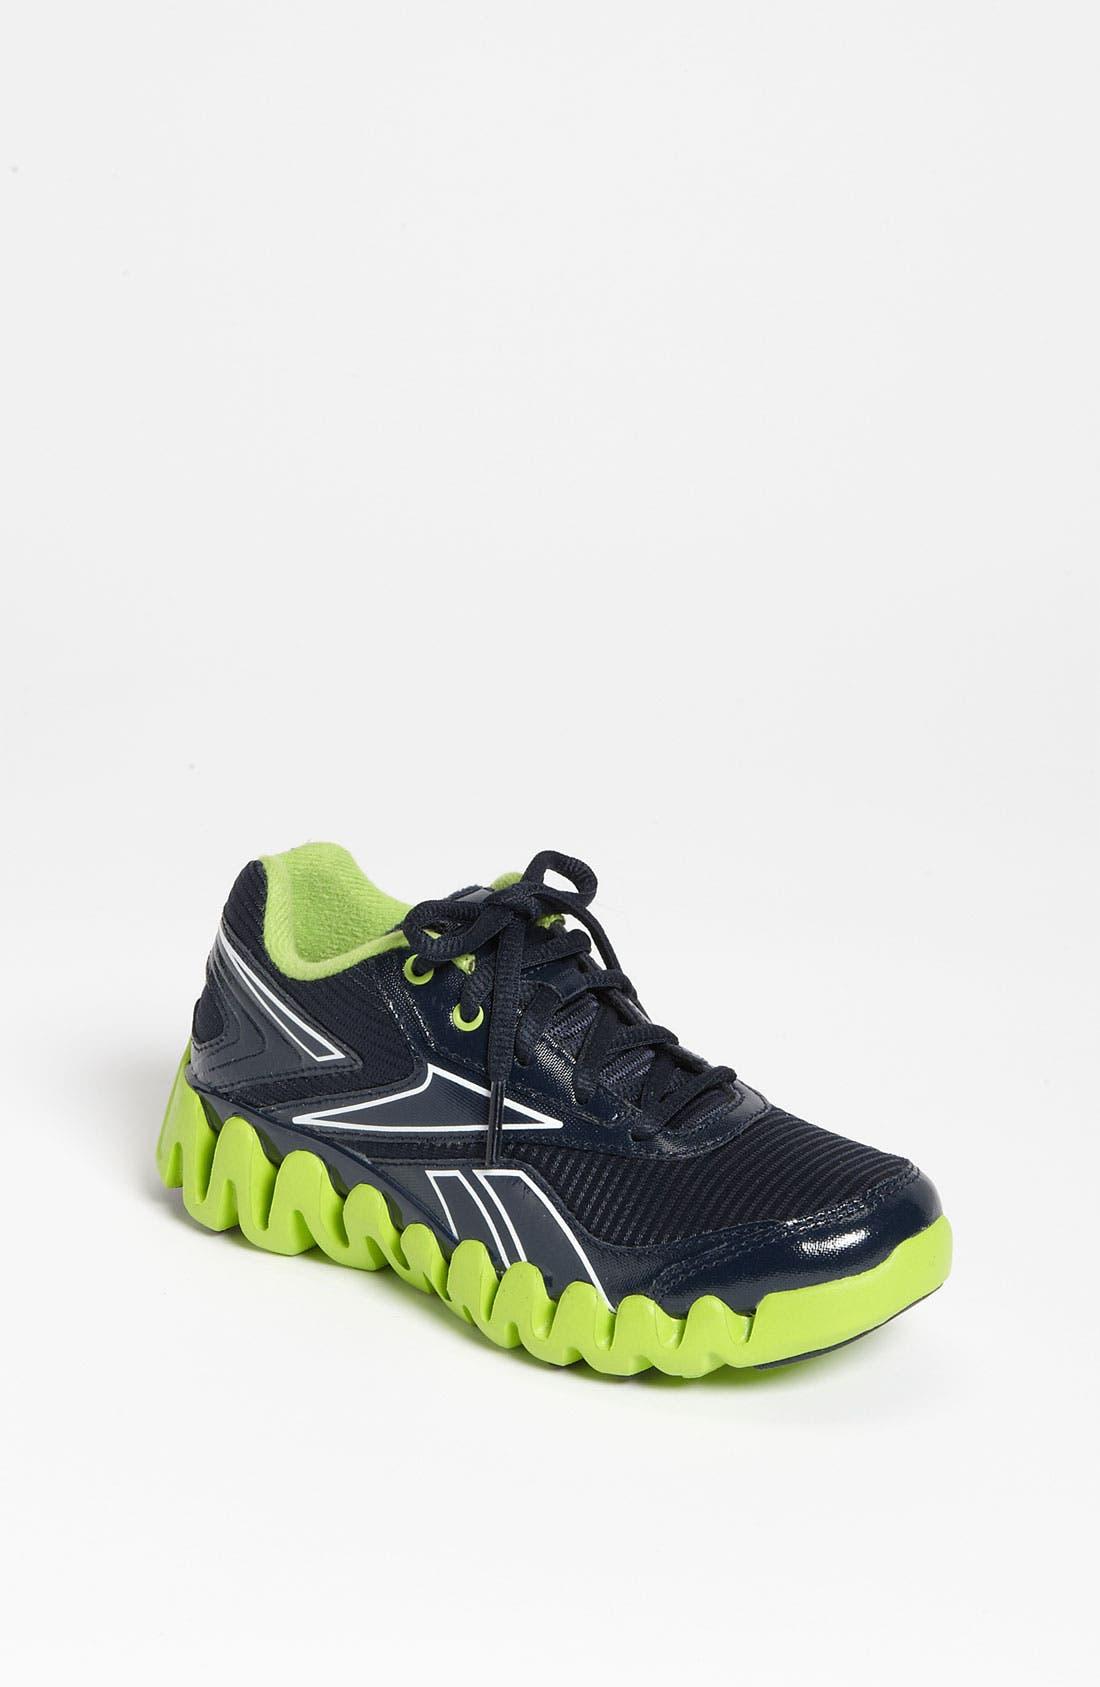 Main Image - Reebok 'ZigActivate' Running Shoe (Toddler, Little Kid & Big Kid)